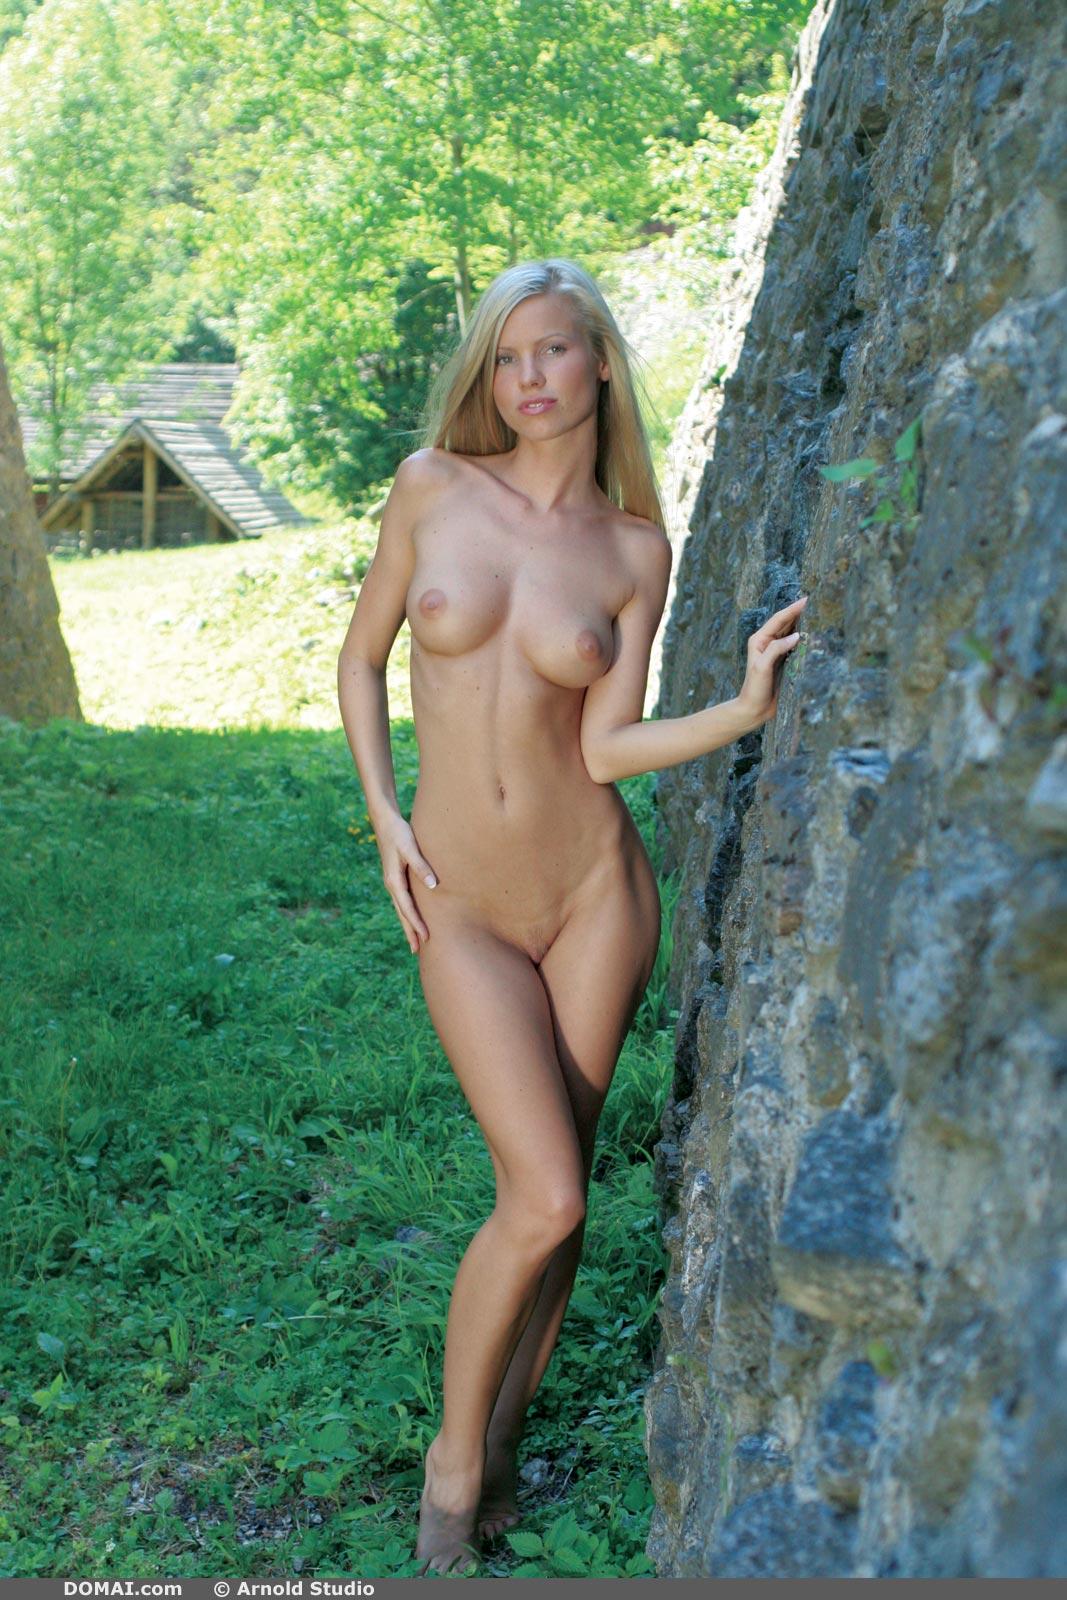 Jenny Blonde Bombshell - NudesPuri.com